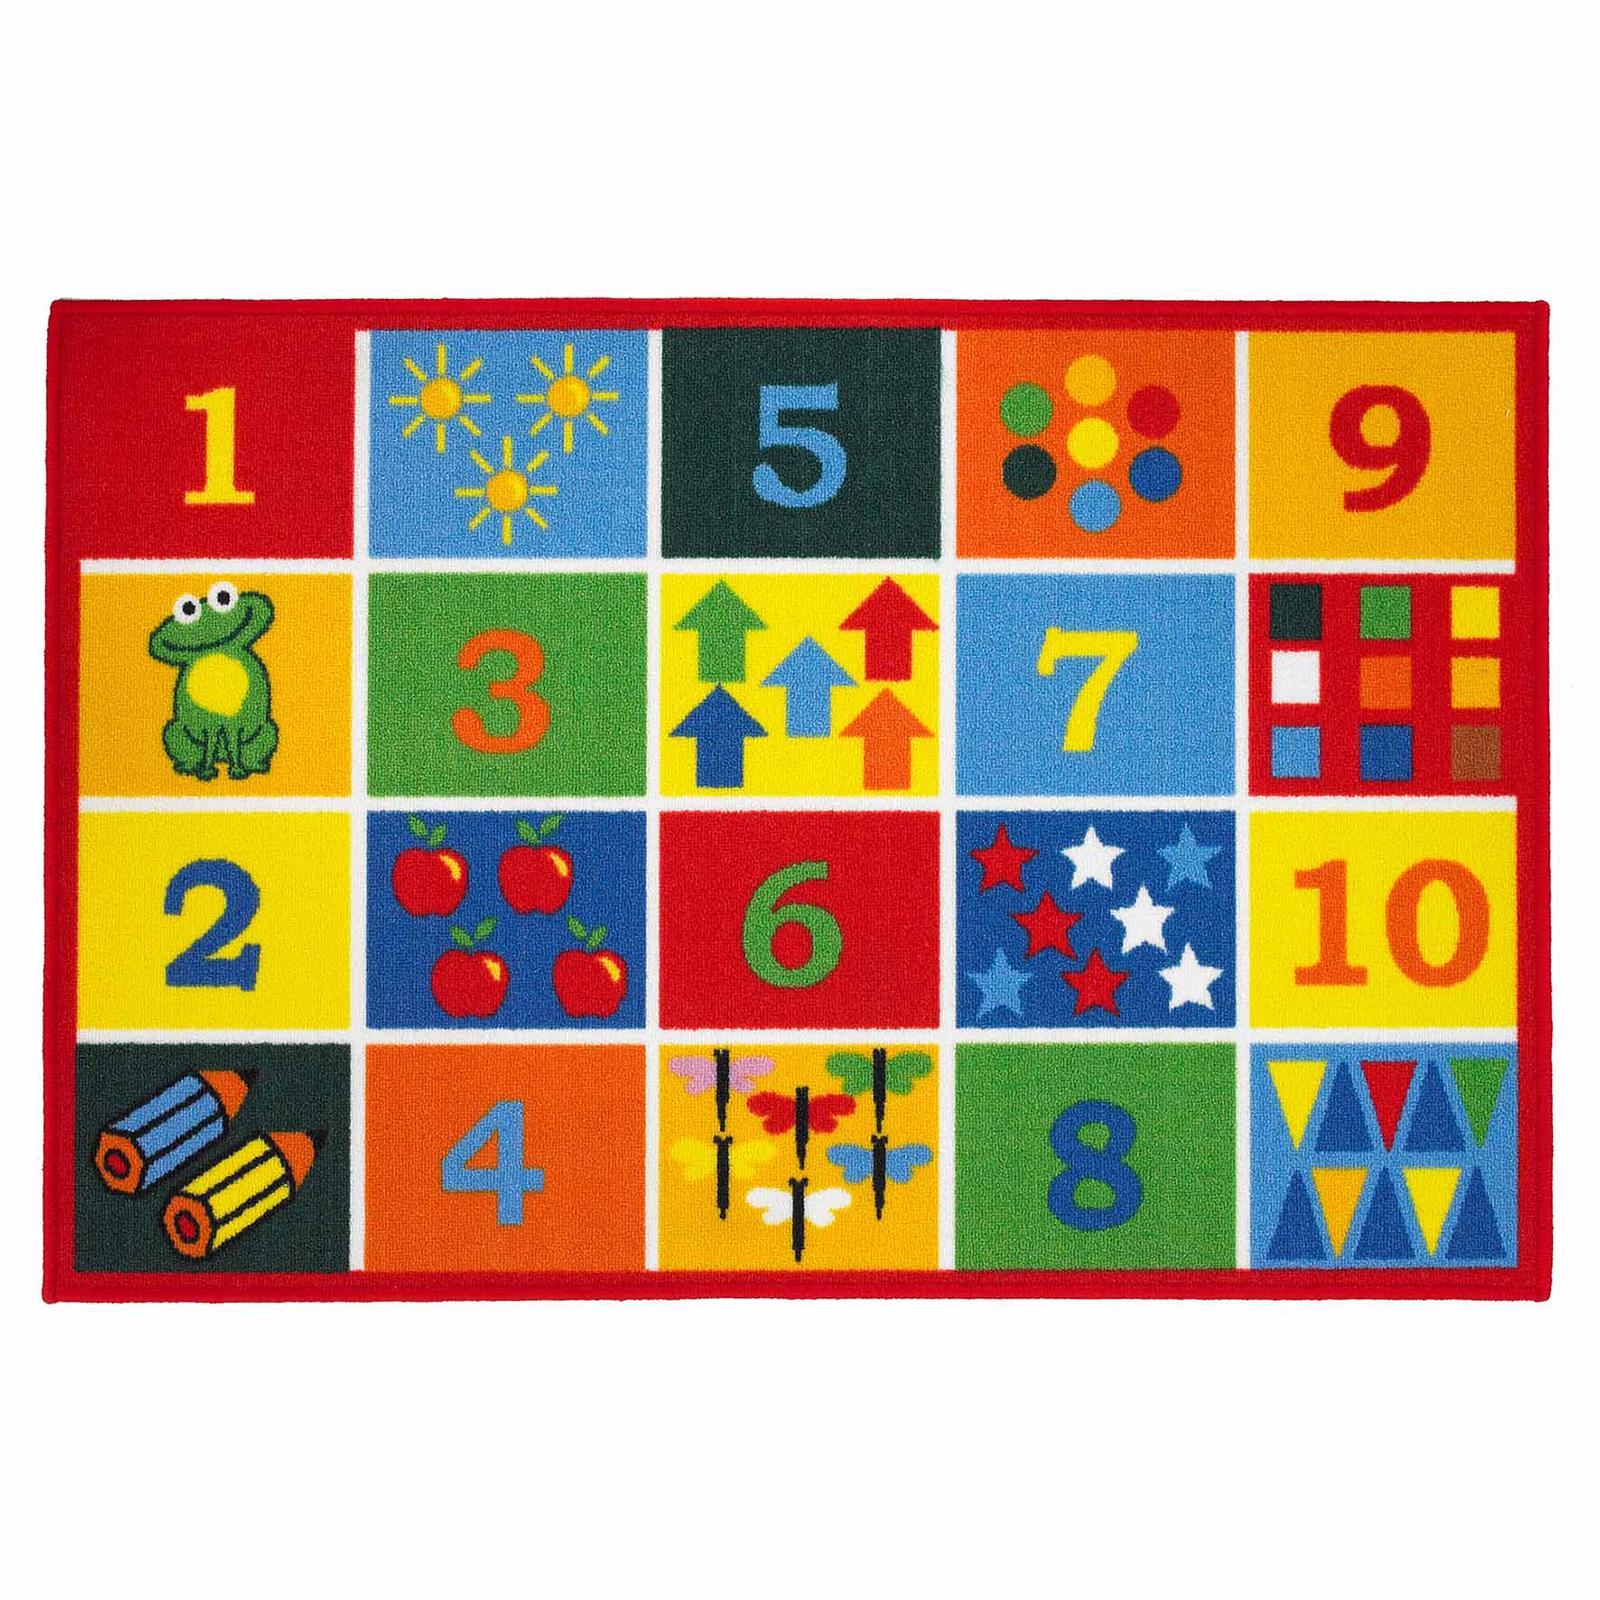 PLAYTIME NUMBERS KIDS RUG - MULTI